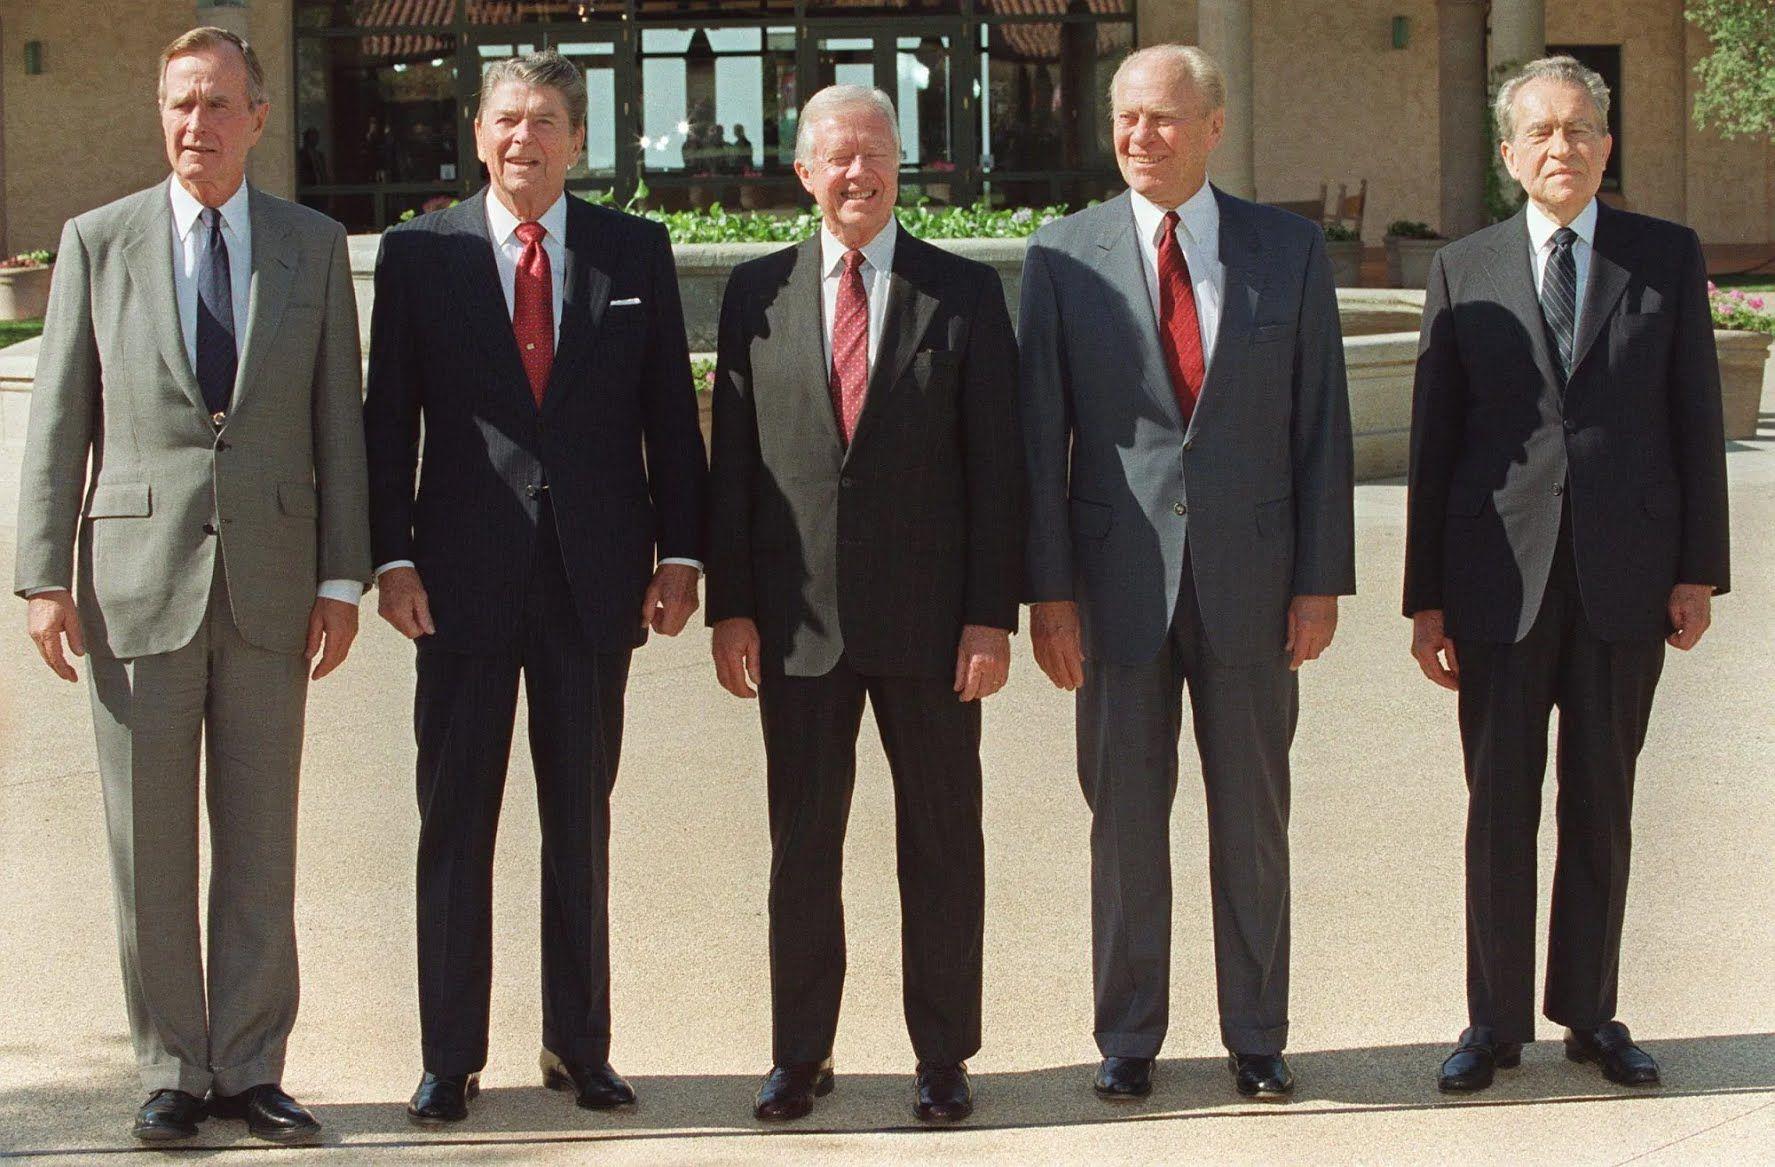 Джордж Буш-старший, Рональд Рейган, Джимми Картер, Джеральд Форд и Ричард Никсон